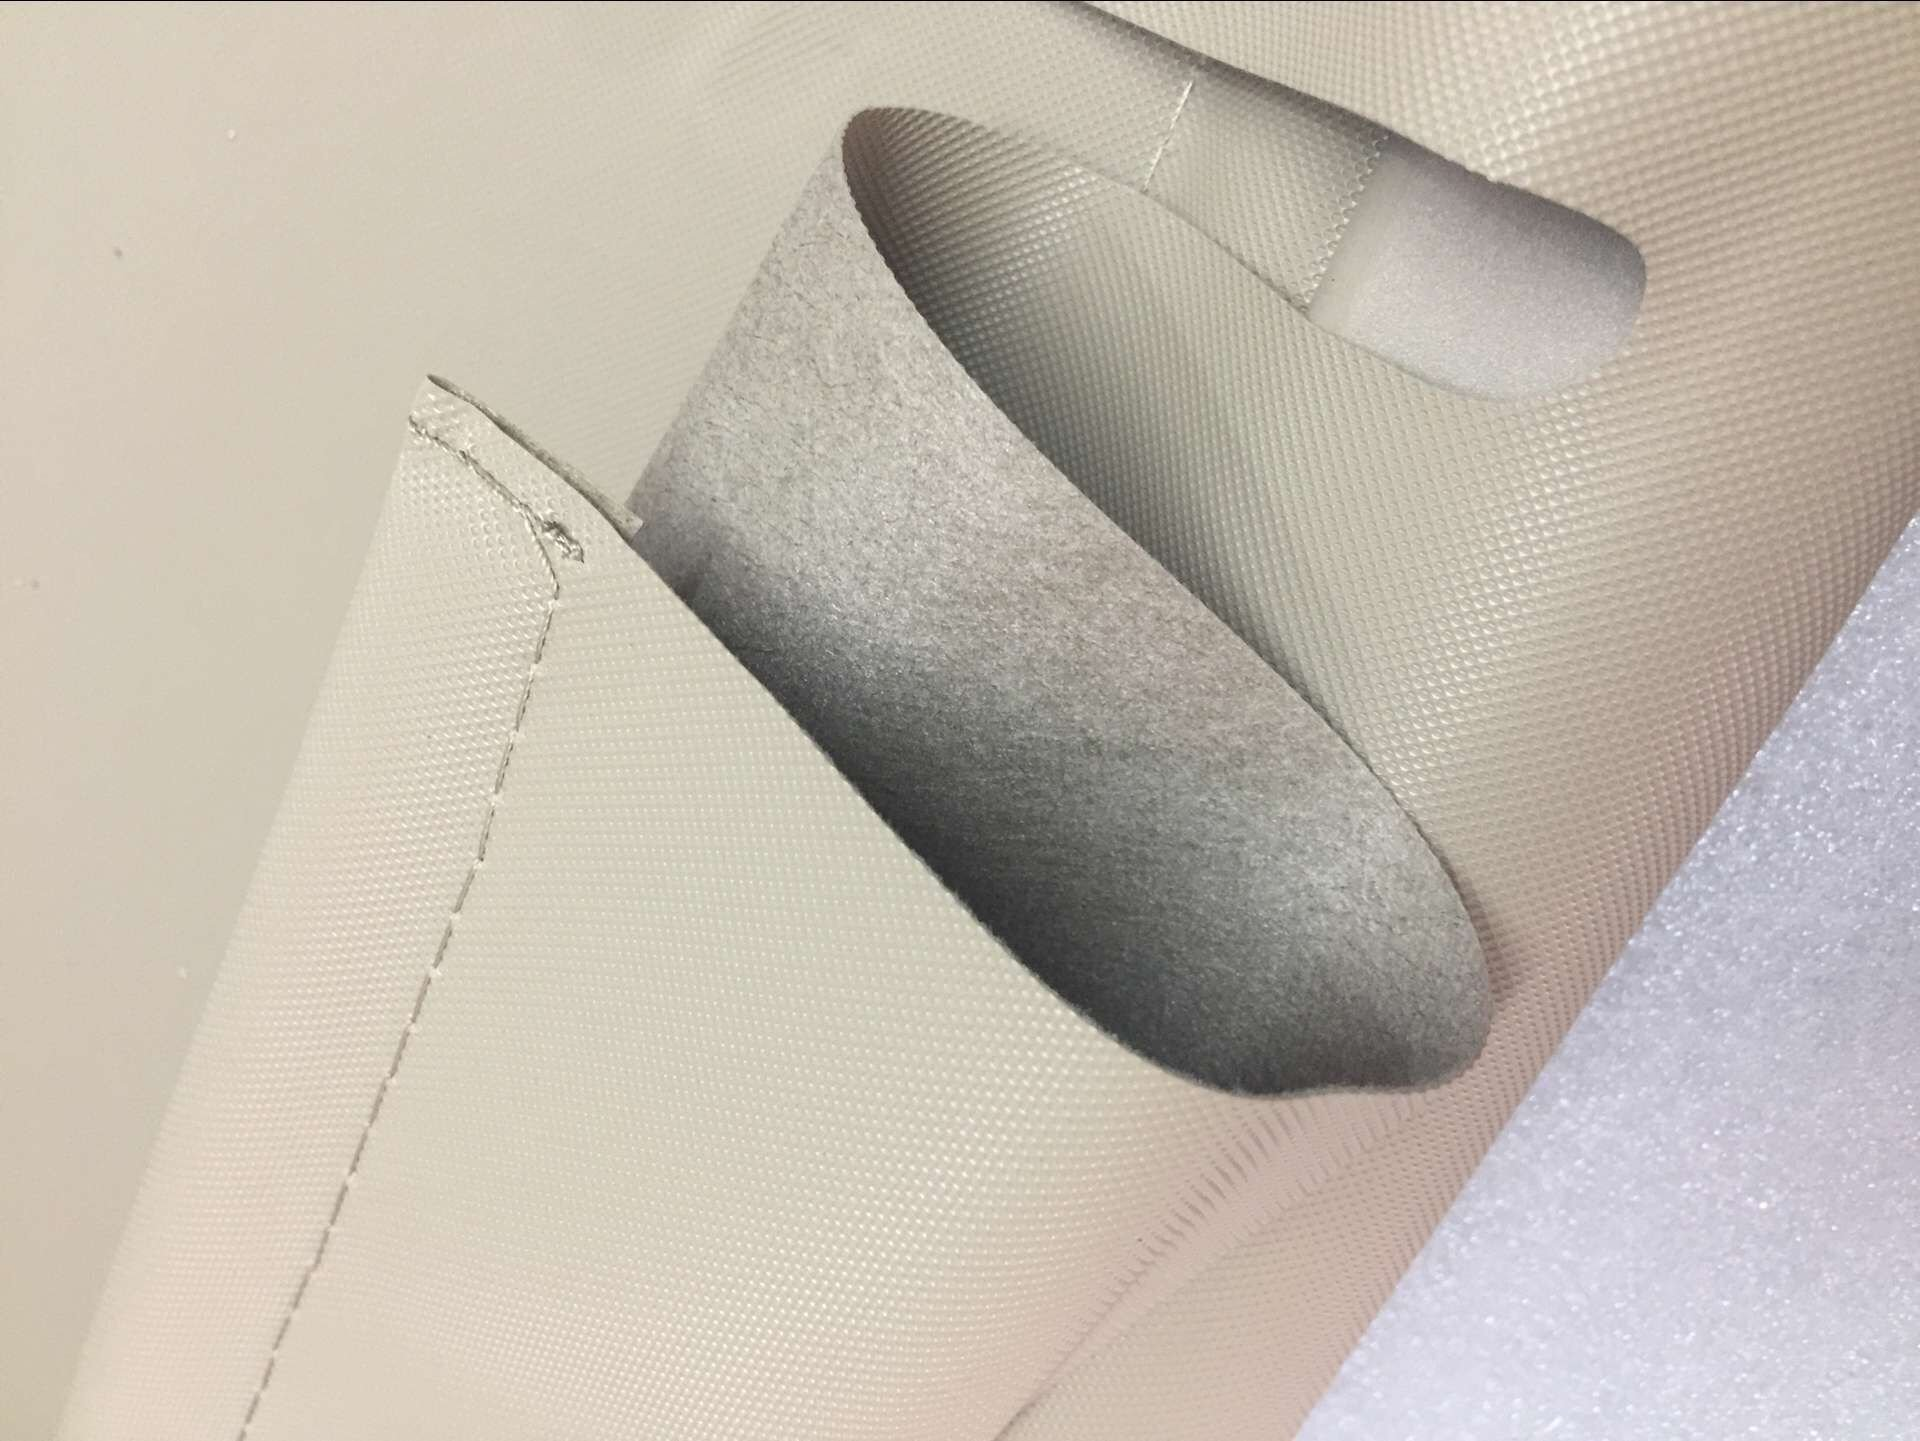 Kaungka Cargo Security Rear Trunk Cover Retractable For 07-15 Audi Q7 Cargo Cover Beige